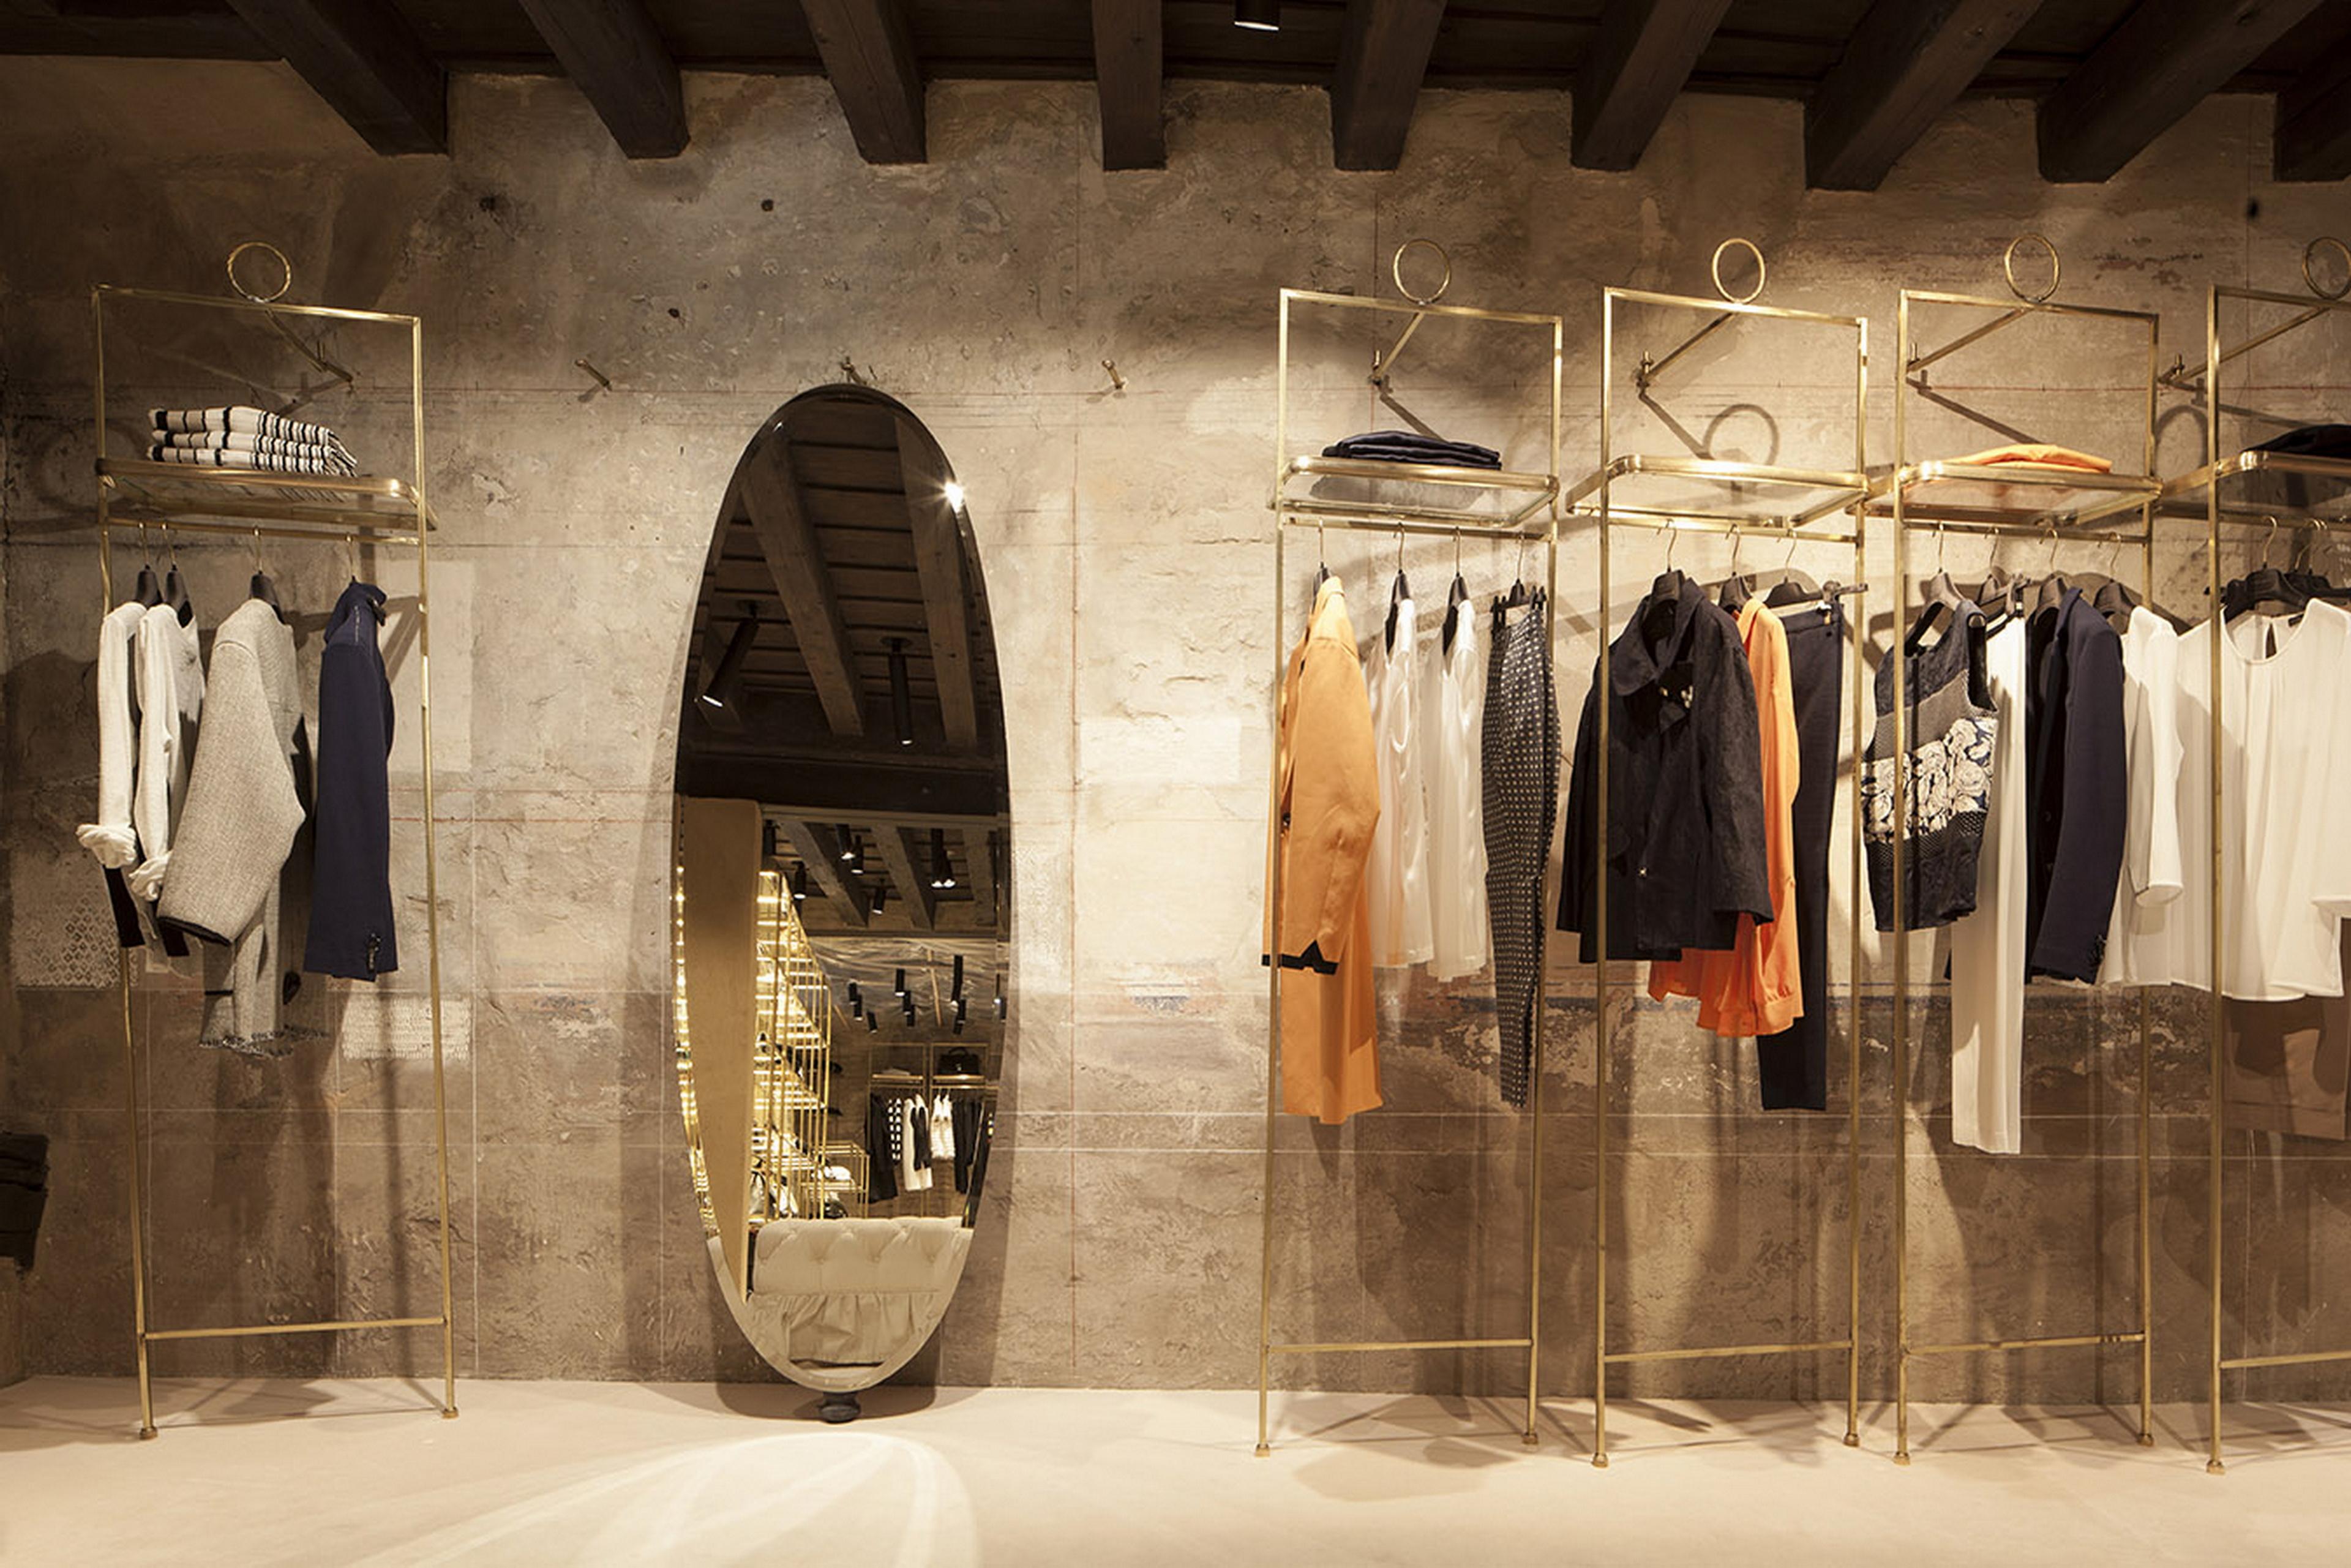 Fabio Gatto store in Treviso, by Isabella Breda, made with TerraVista Smooth Bespoke Cannella and Zenzero, photo by Bruno Pulici